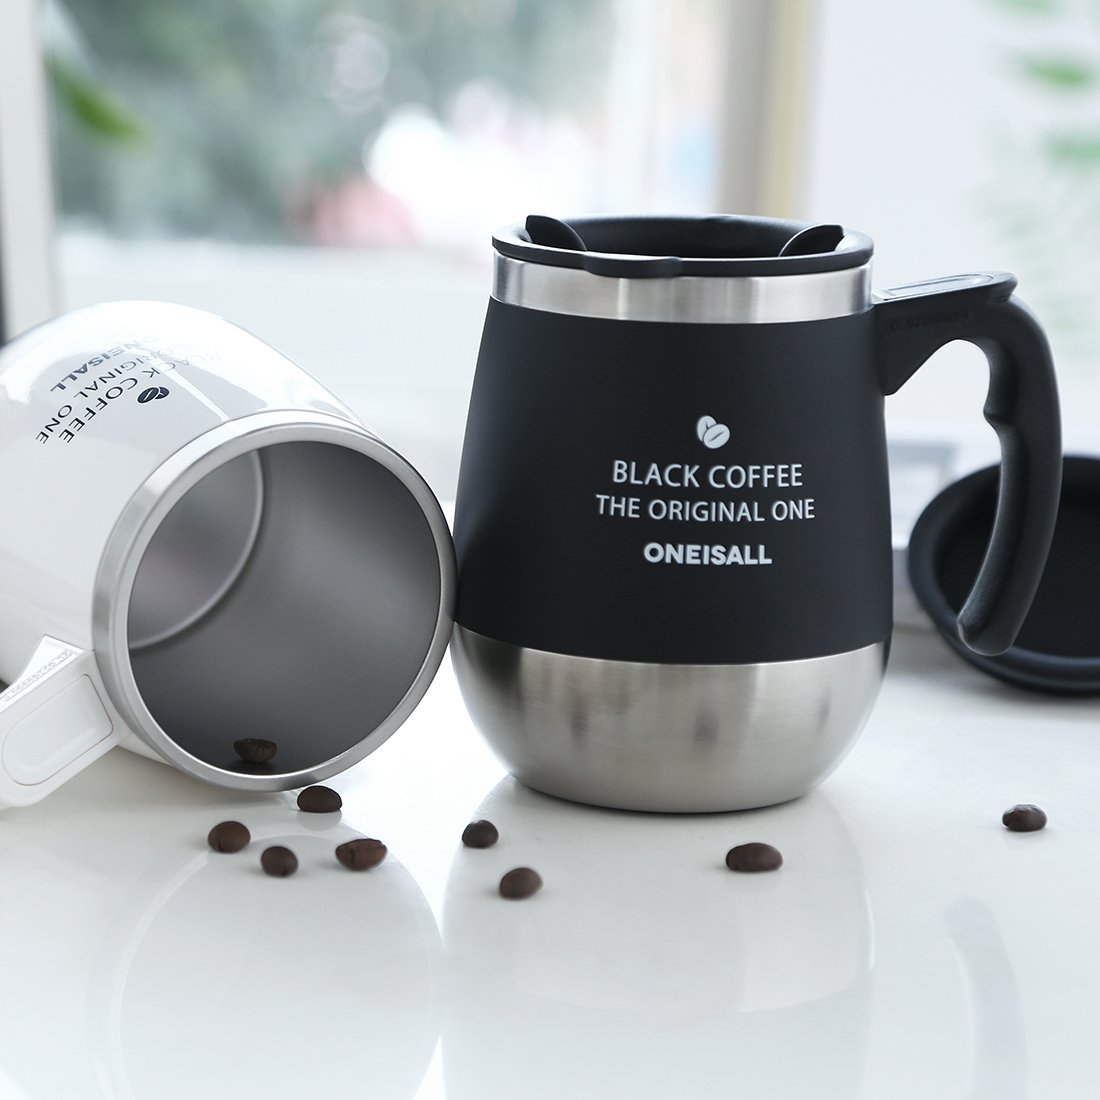 Majestic Product Coffee Mug Oneisall Coffee Travel Mug Stainless Steel Hot Milk Small Coffee Mugs Lids